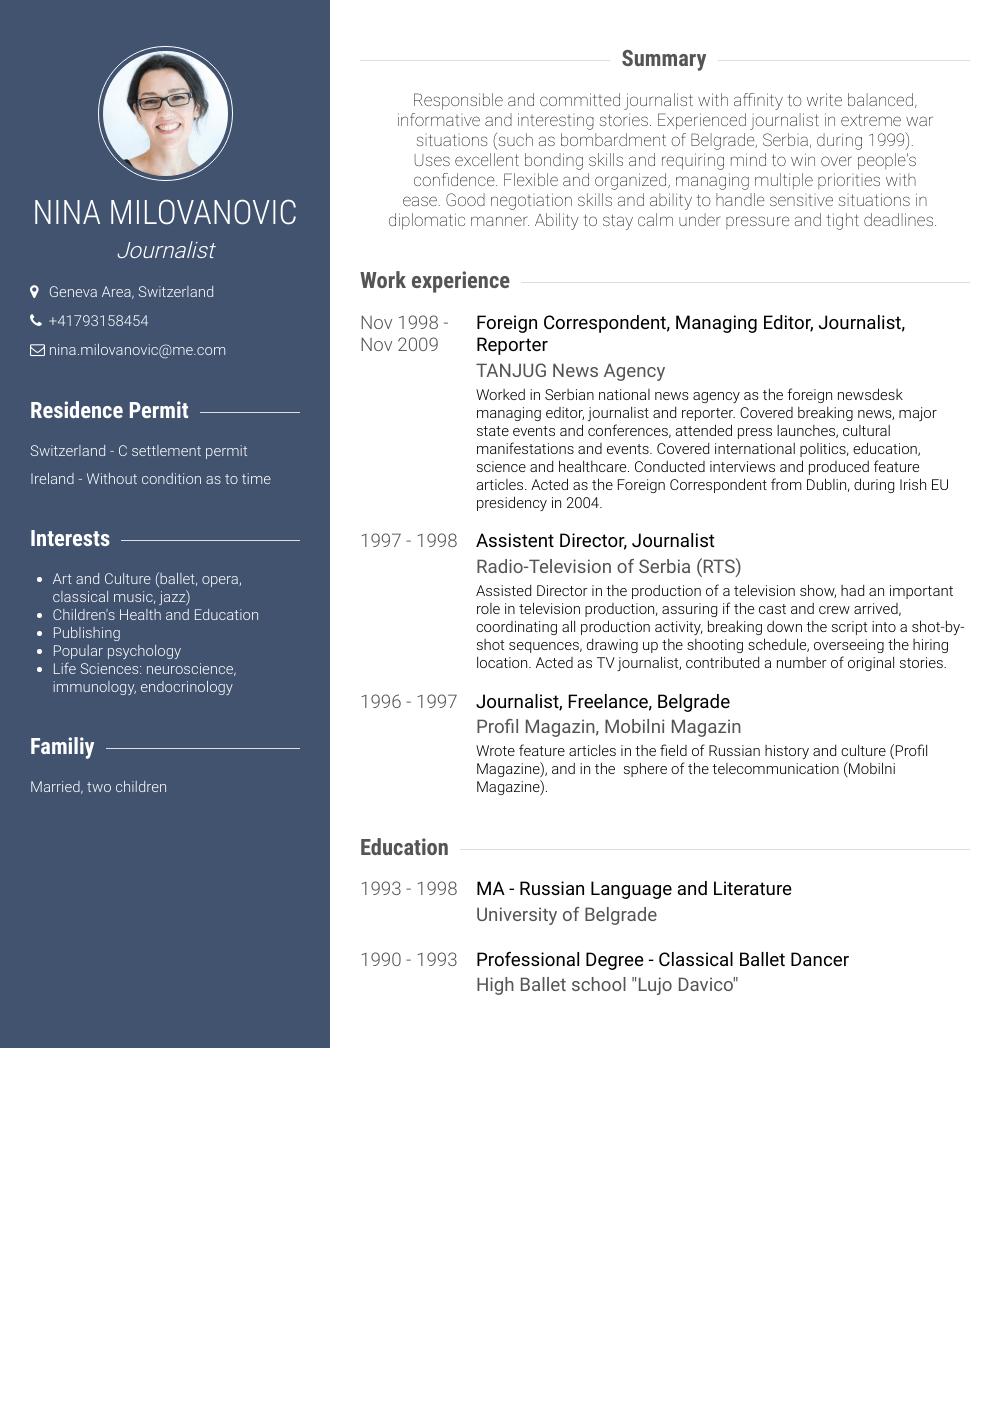 Correspondent Resume Samples And Templates Visualcv